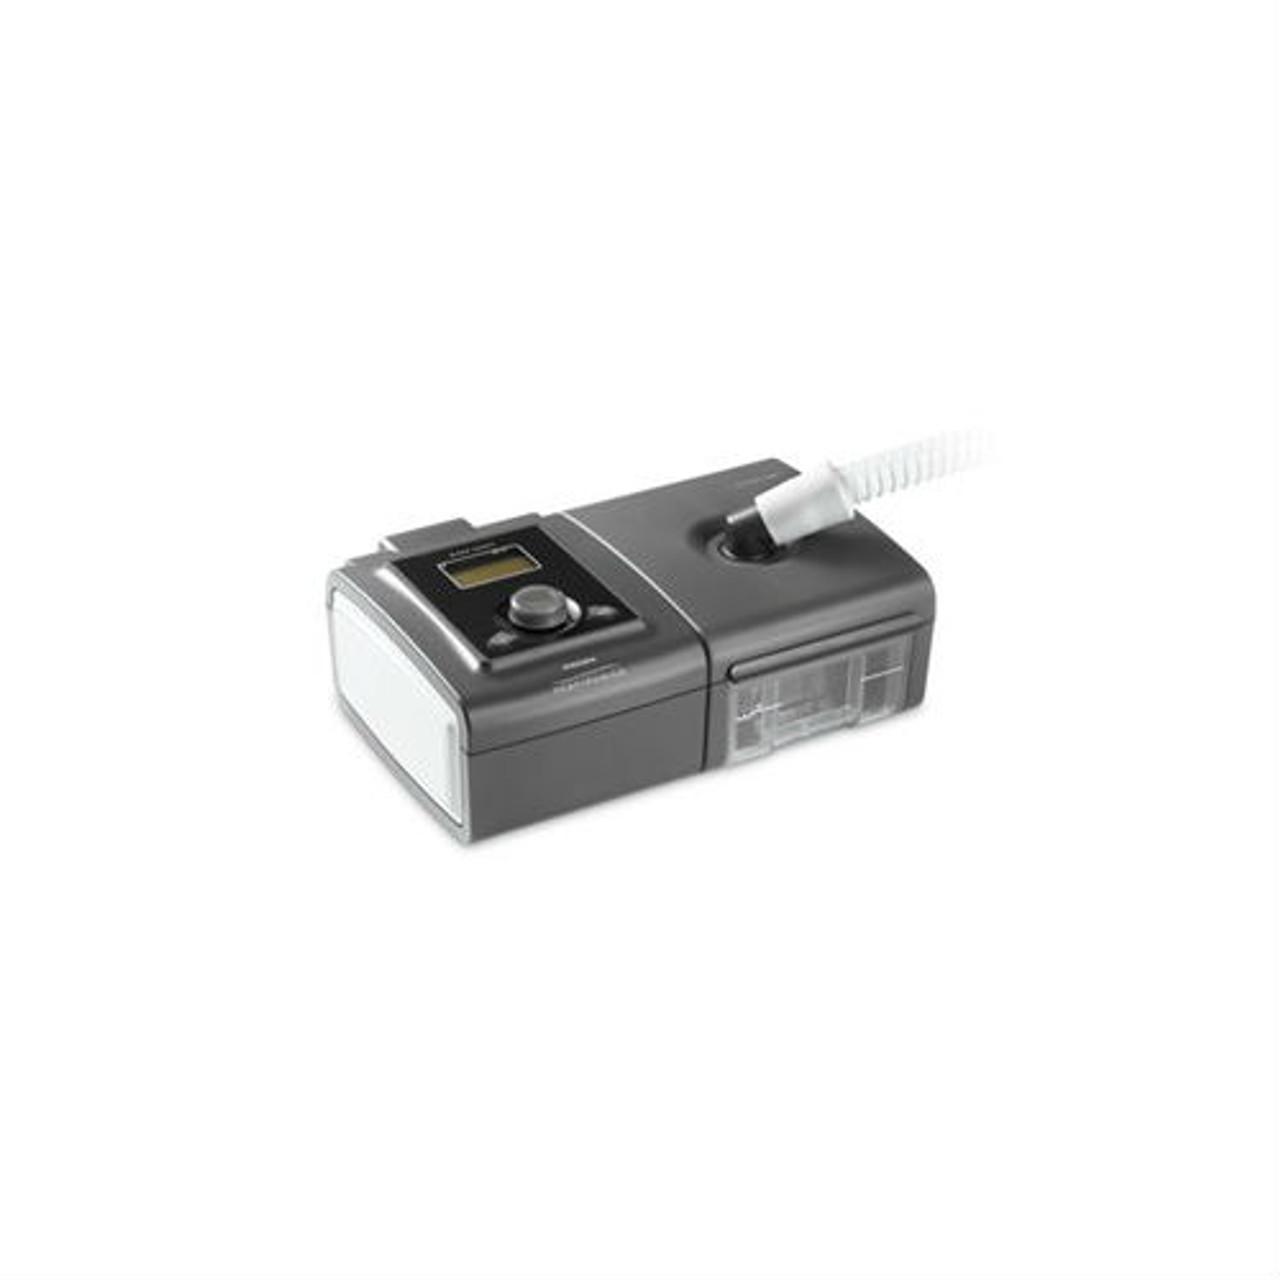 Philips Respironics BIPAP AVAPS System One